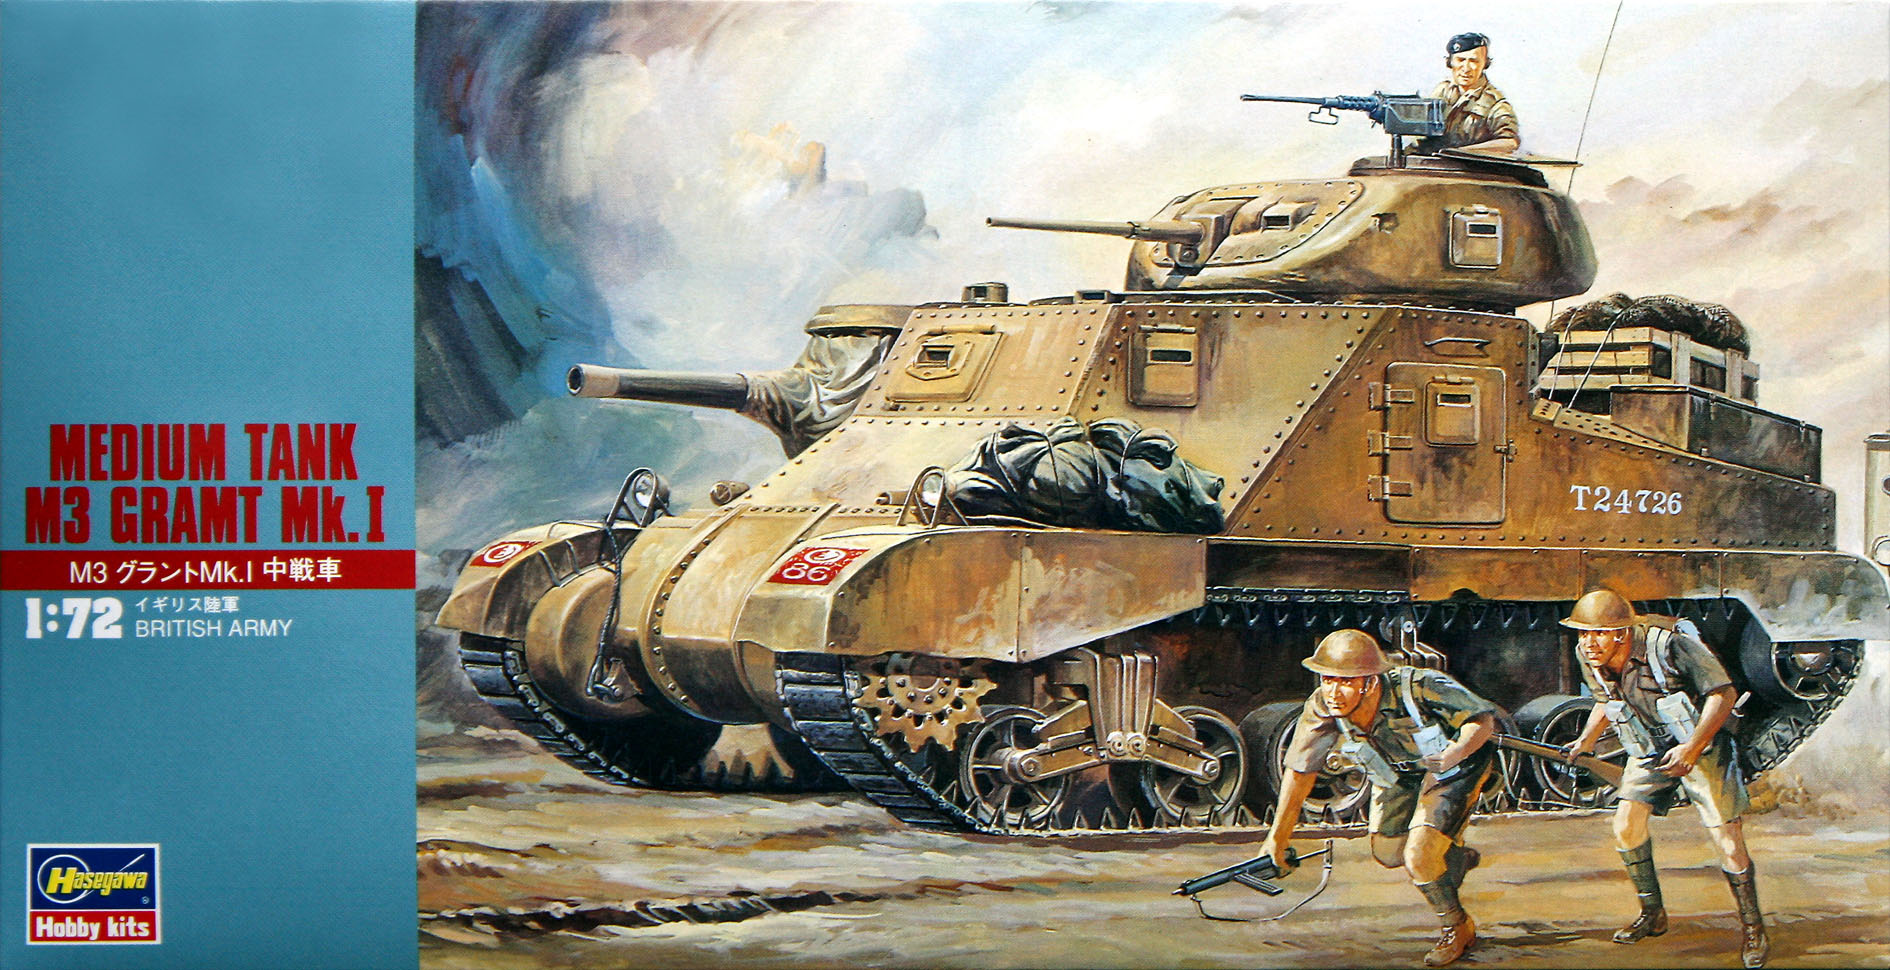 Hasegawa 1/72 Medium Tank M3 Grant Mk.I